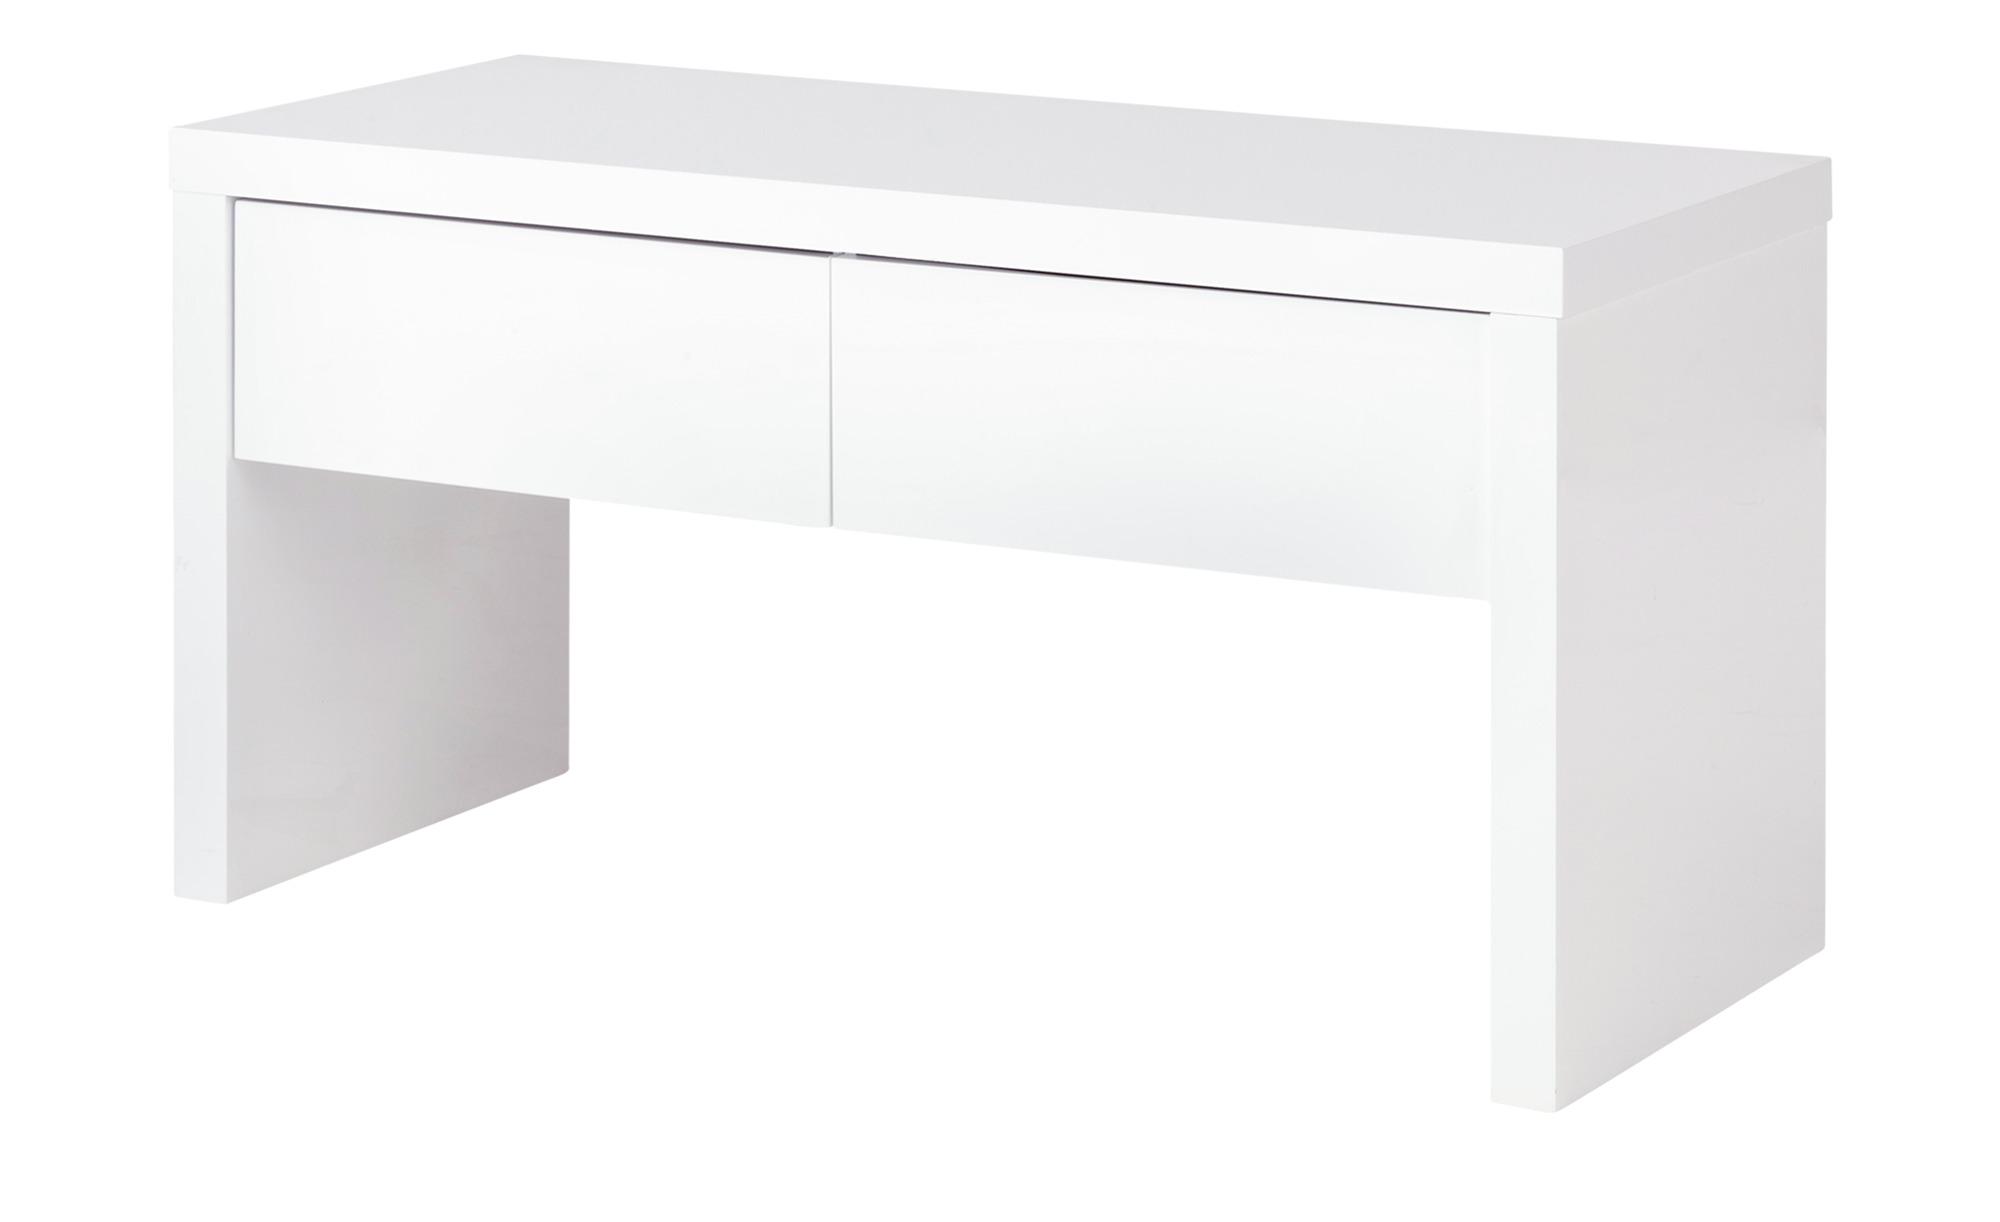 Garderobenbank Torri Gefunden Bei Möbel Höffner